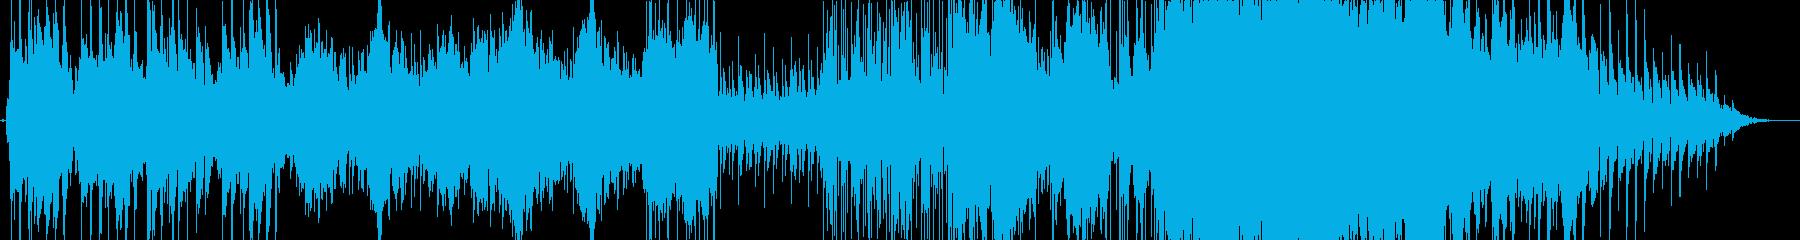 Searchingの再生済みの波形